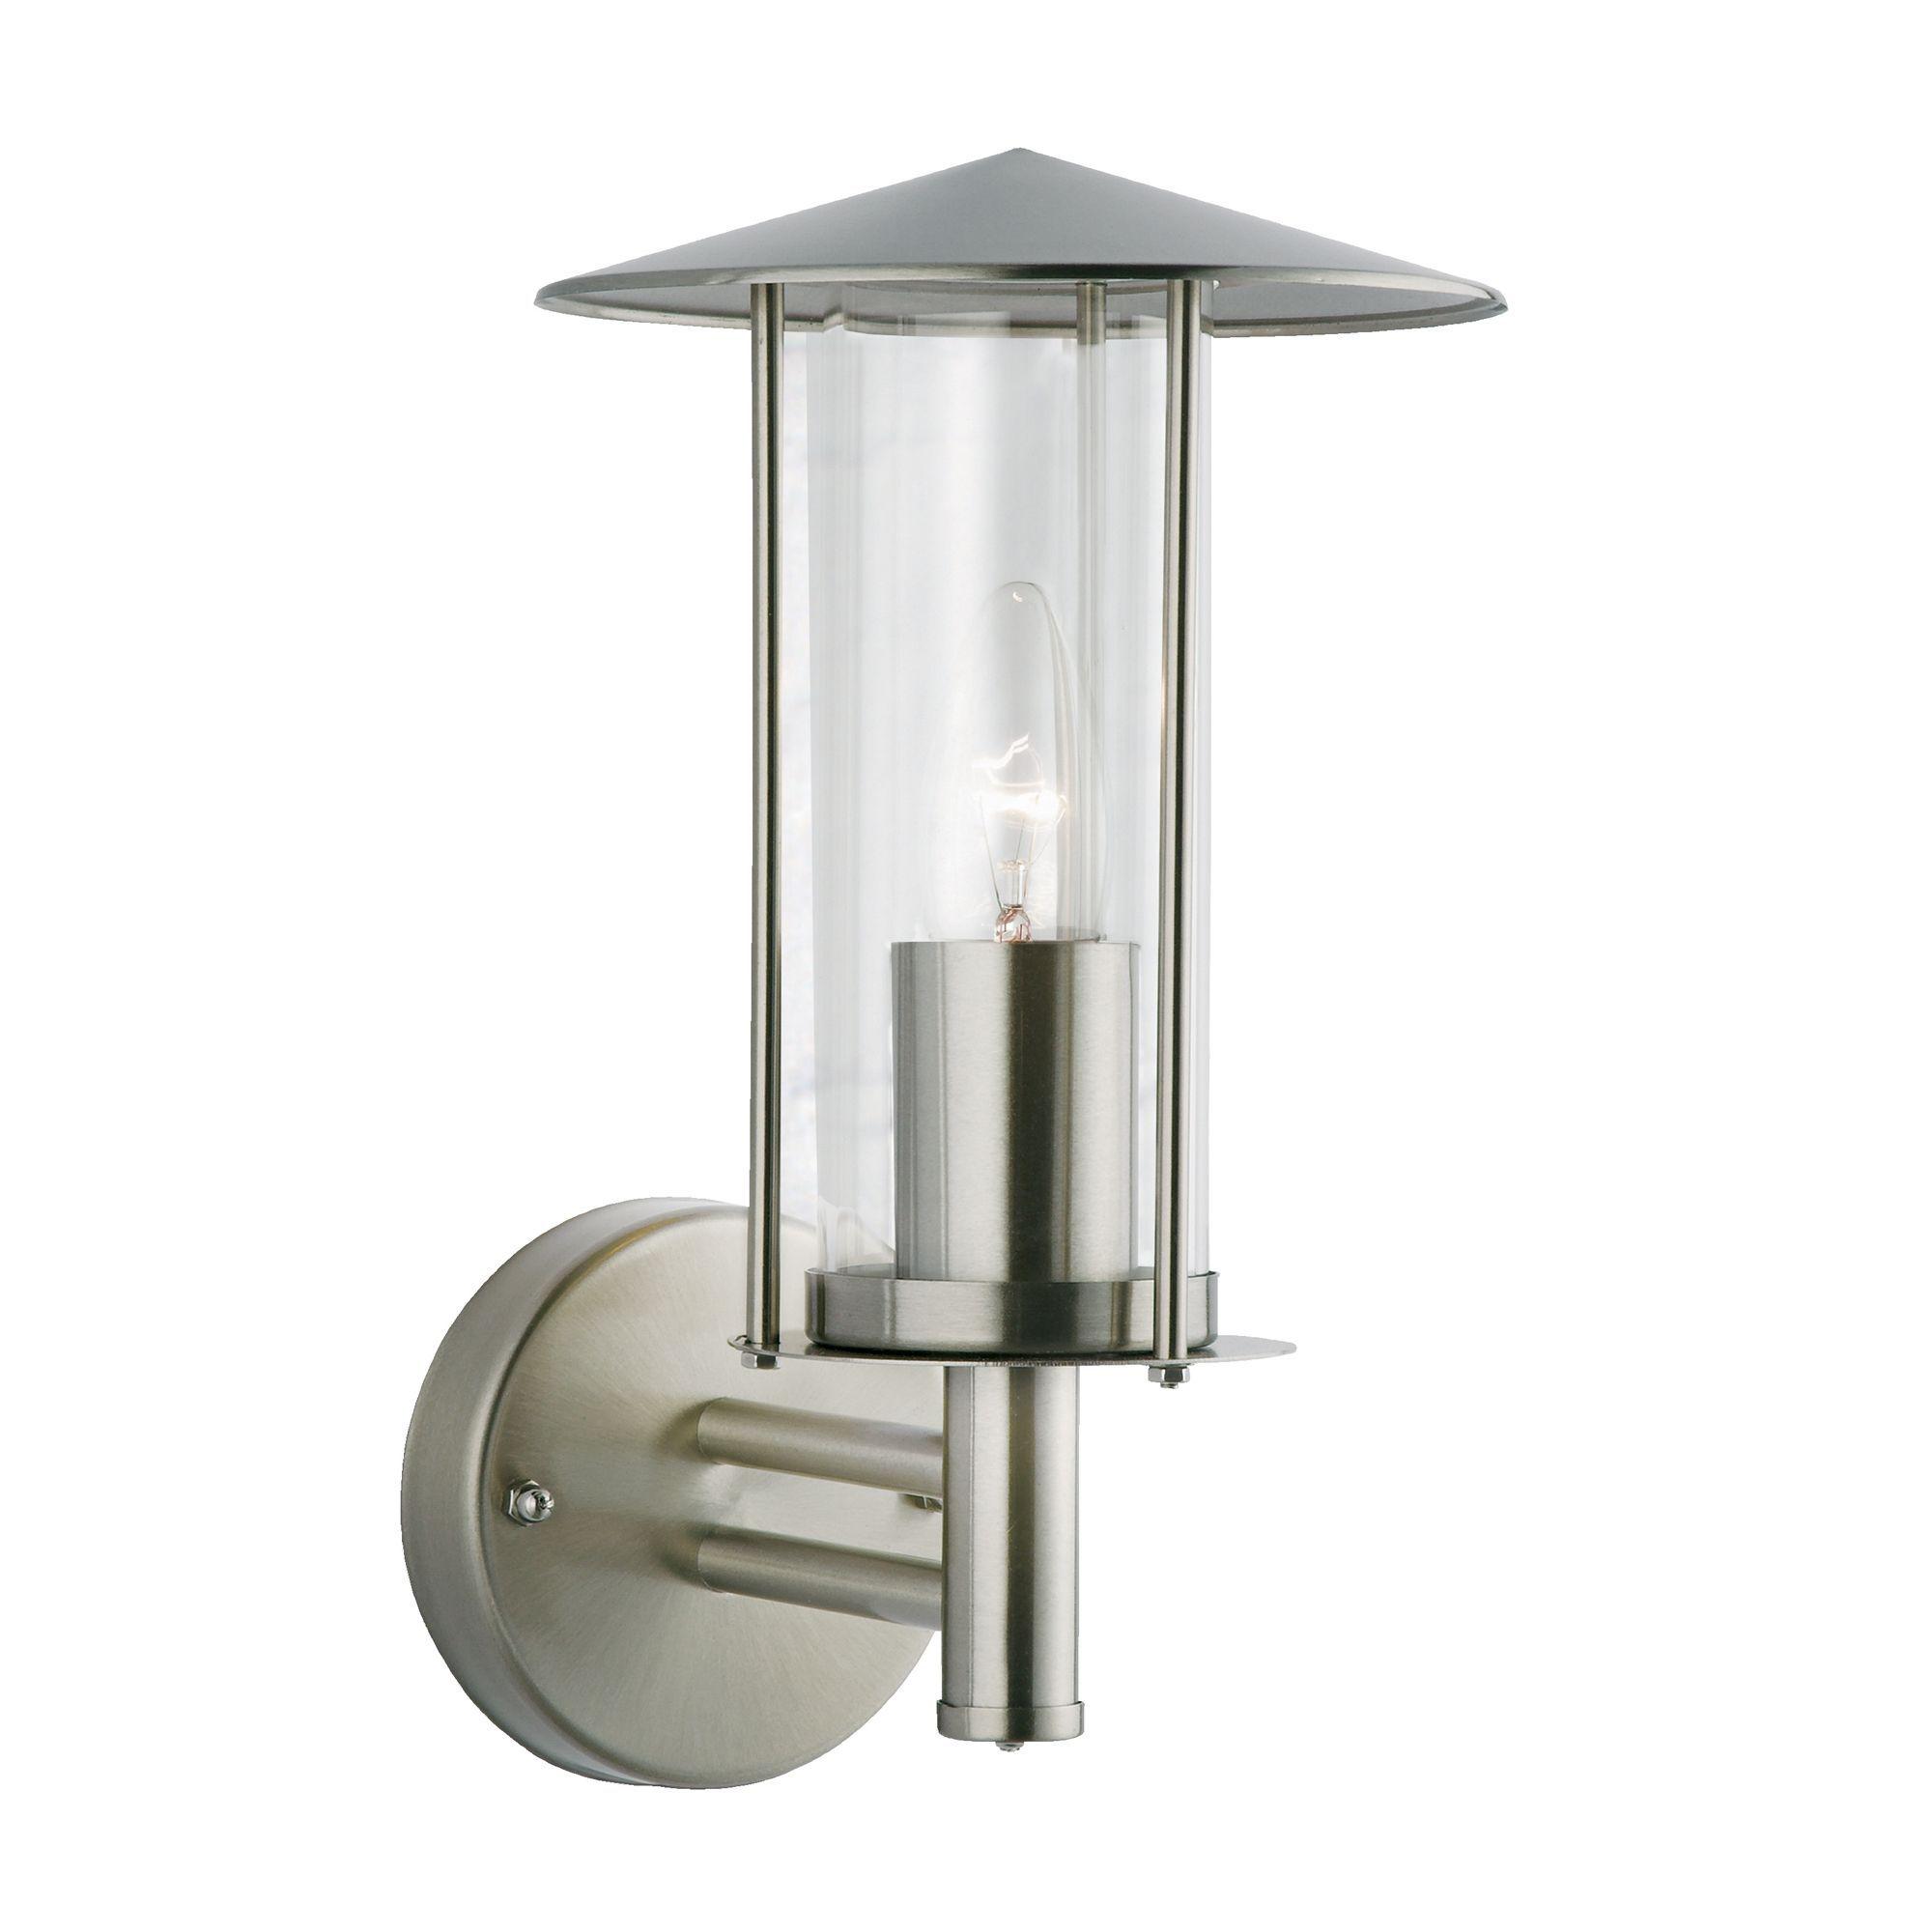 Outdoor porch lamp - Outdoor Porch Lamp 31